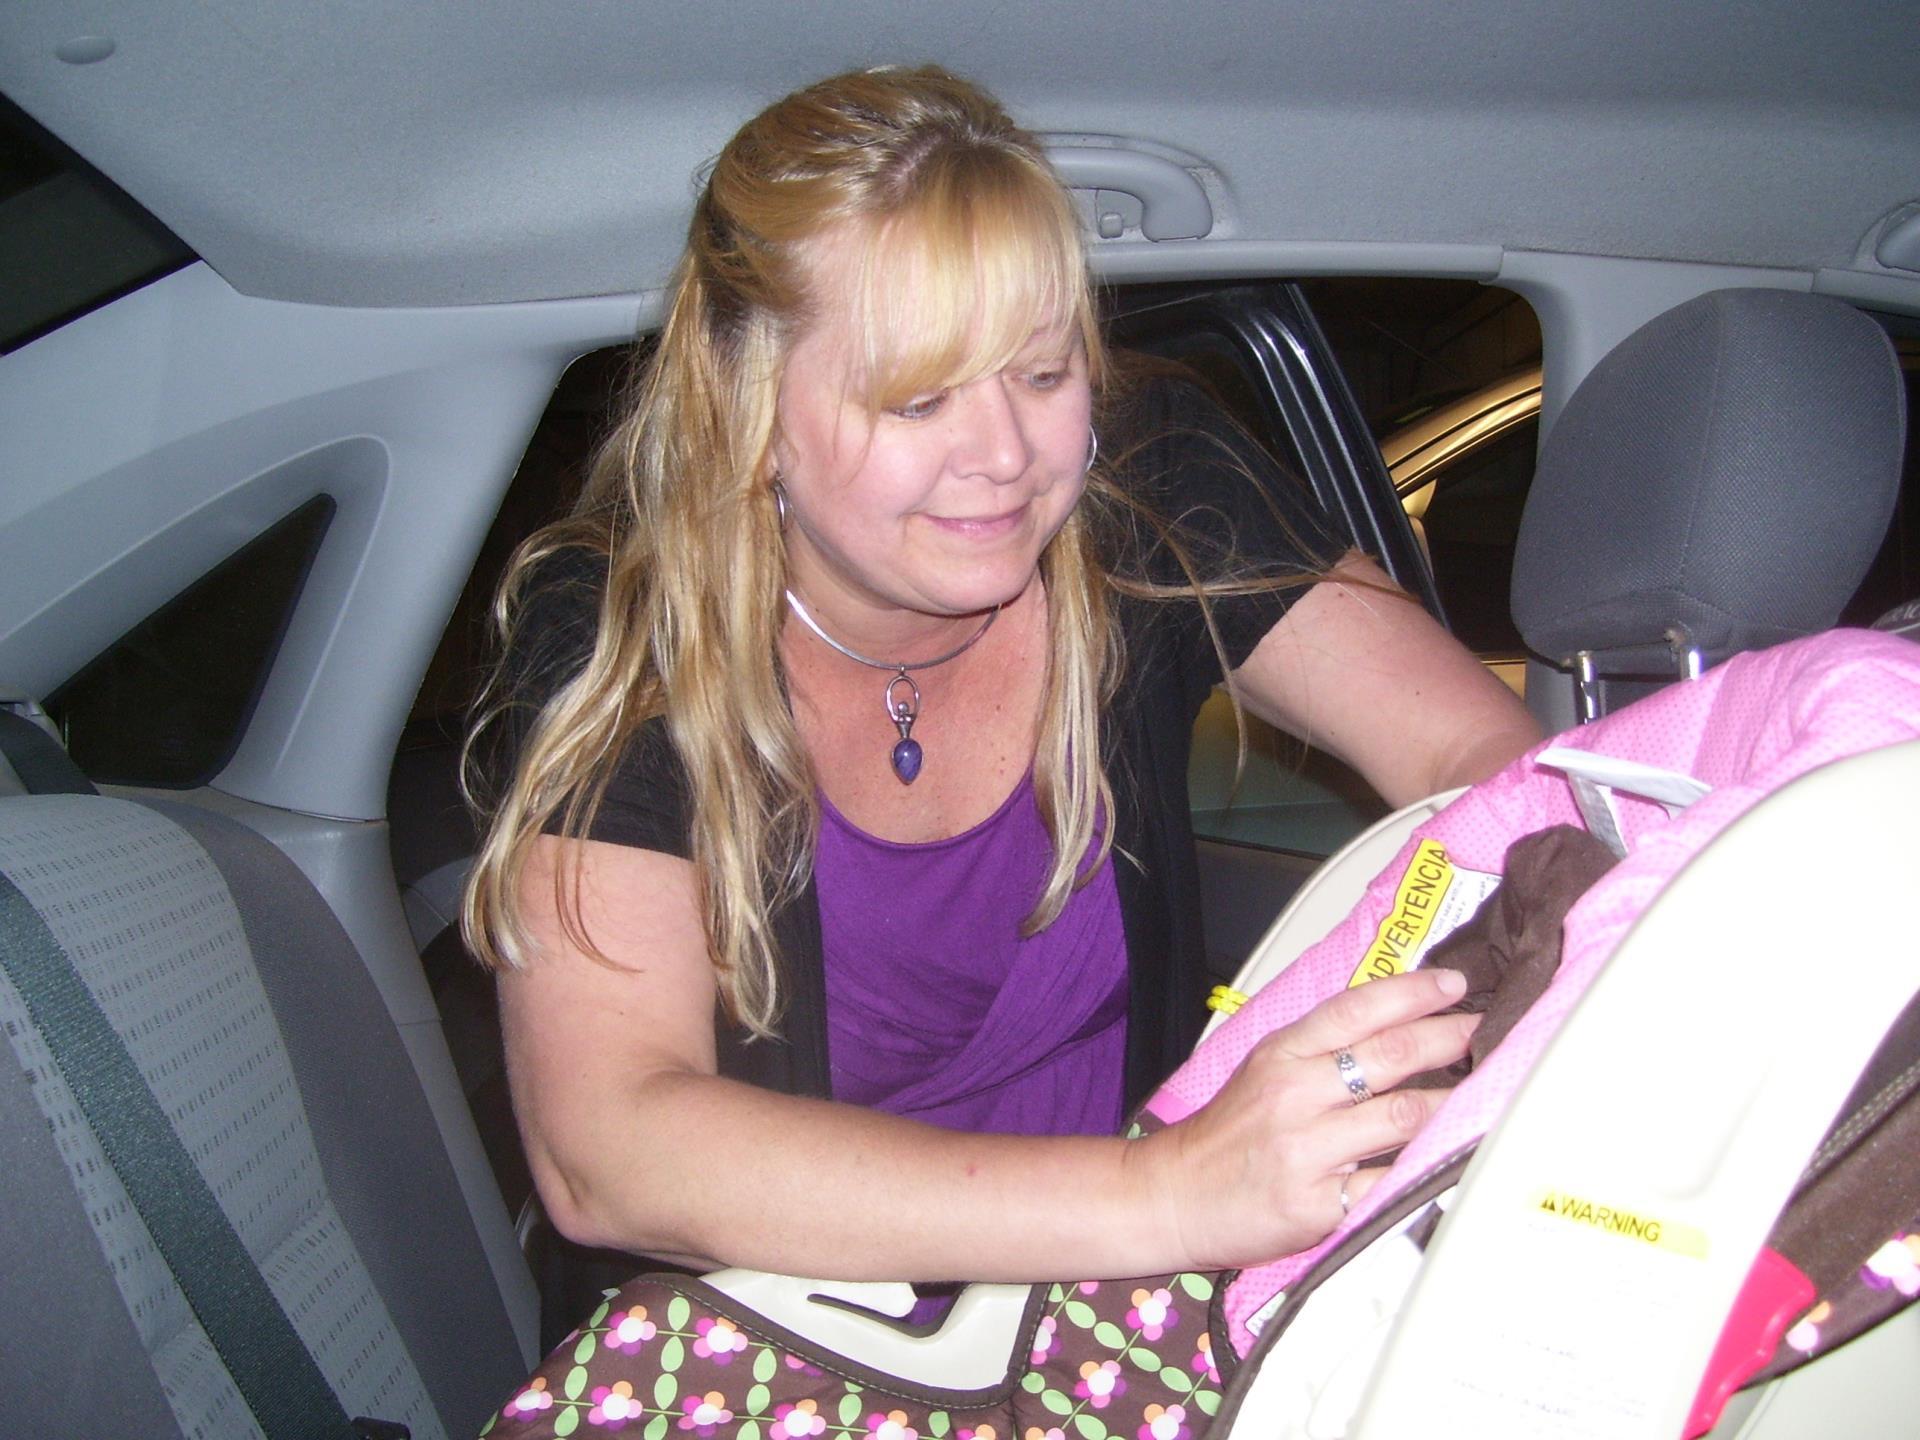 Car Seat Installation & Safety Checks | Wauwatosa, WI